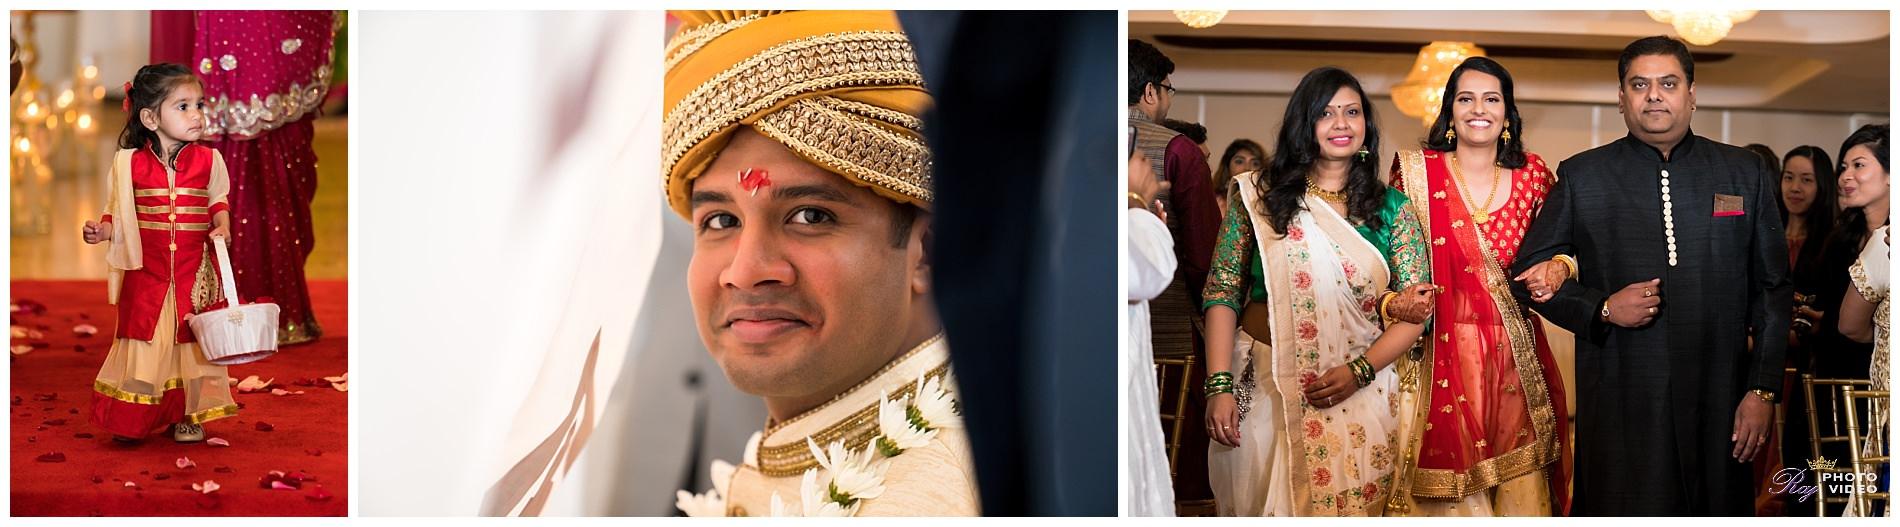 Martinsville-Gardens-NJ-Indian-Wedding-Ruchi-Vishal-24.jpg